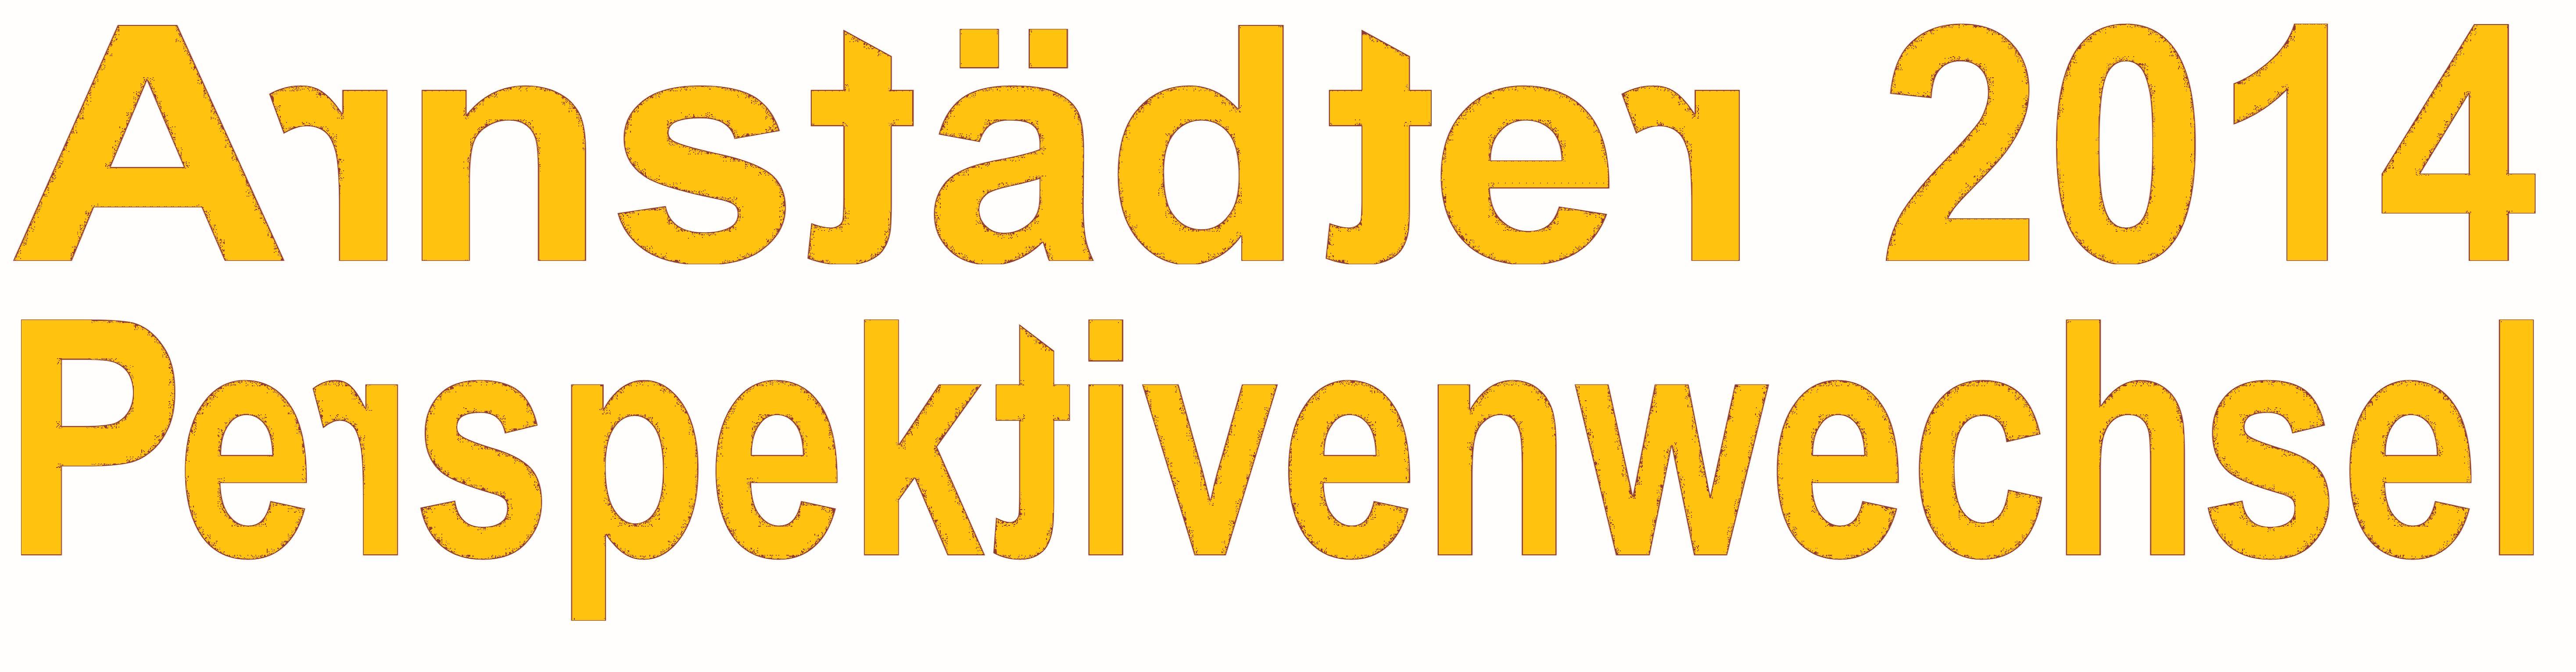 Logo Perspektivenwechsel 2014_b